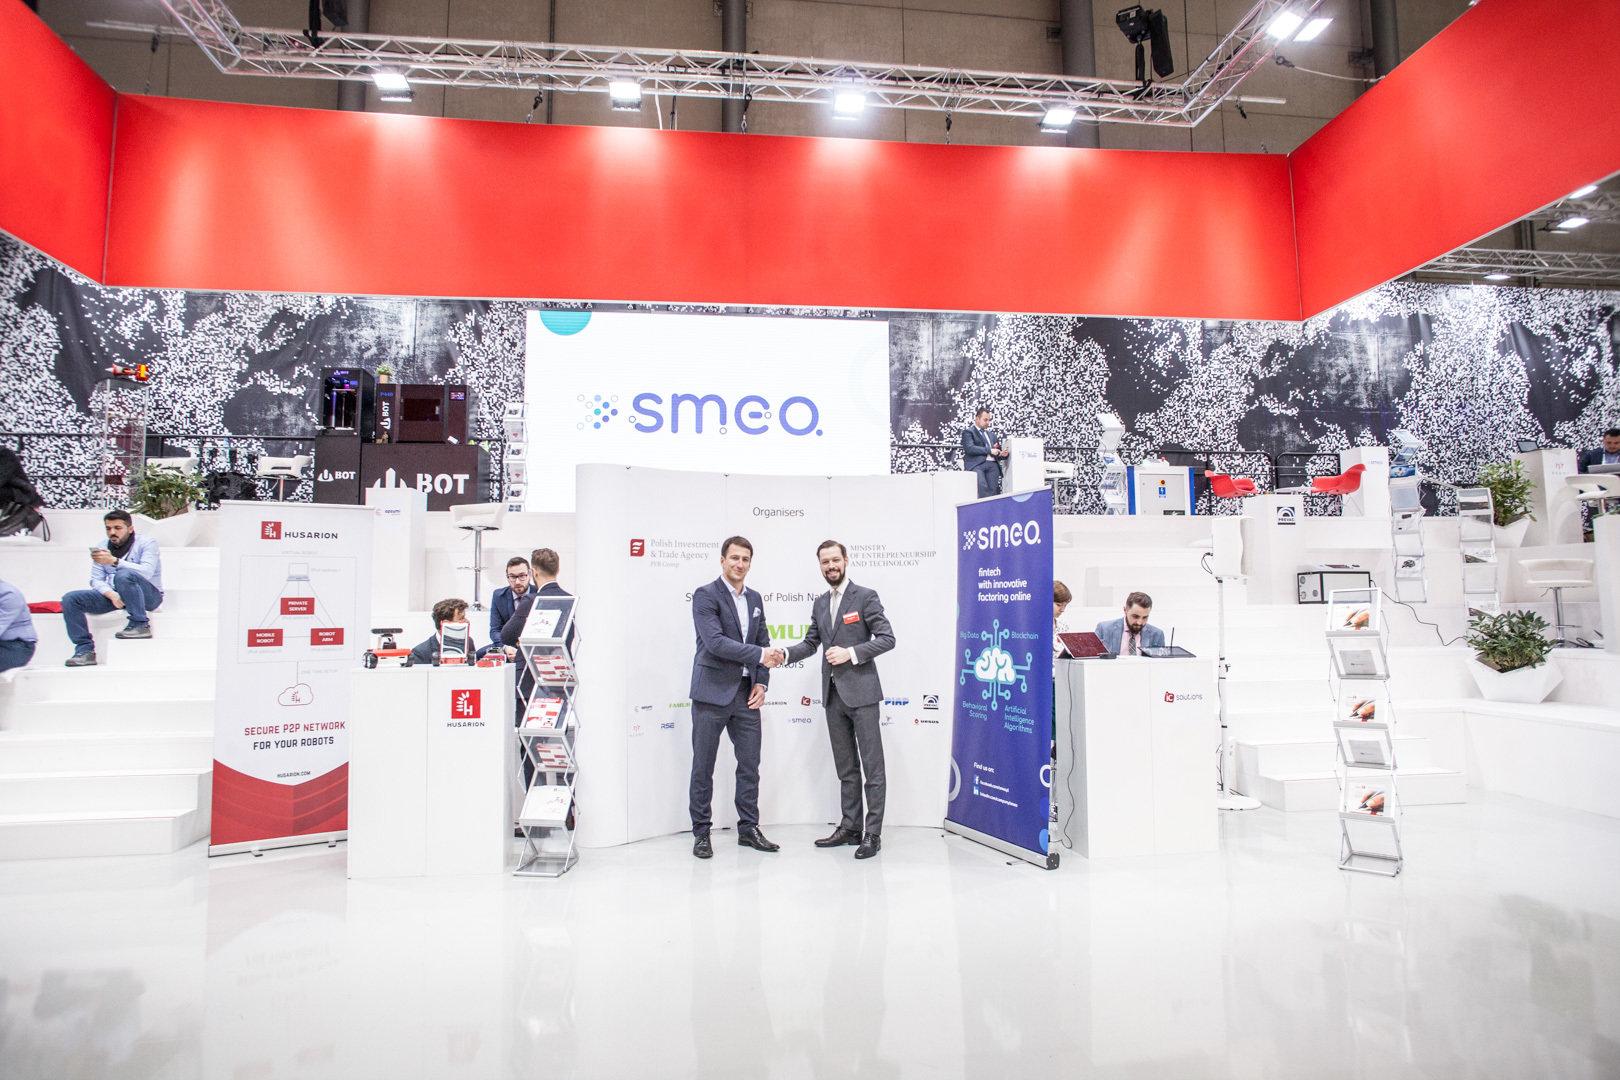 Sukces polskiego fintechu SMEO na Hannover Messe